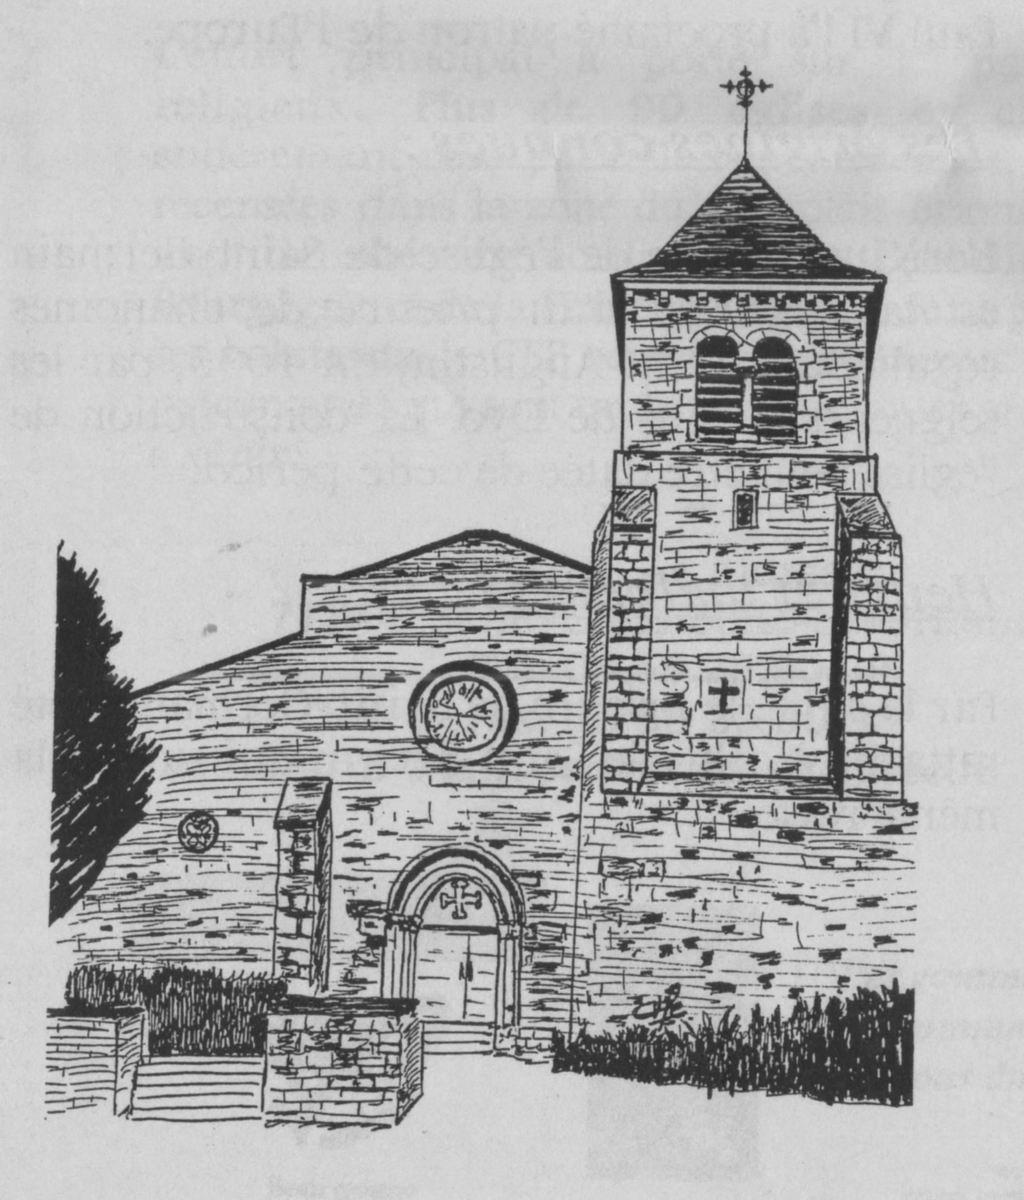 France saone et loire saint germain en brionnais eglise - Eglise dessin ...